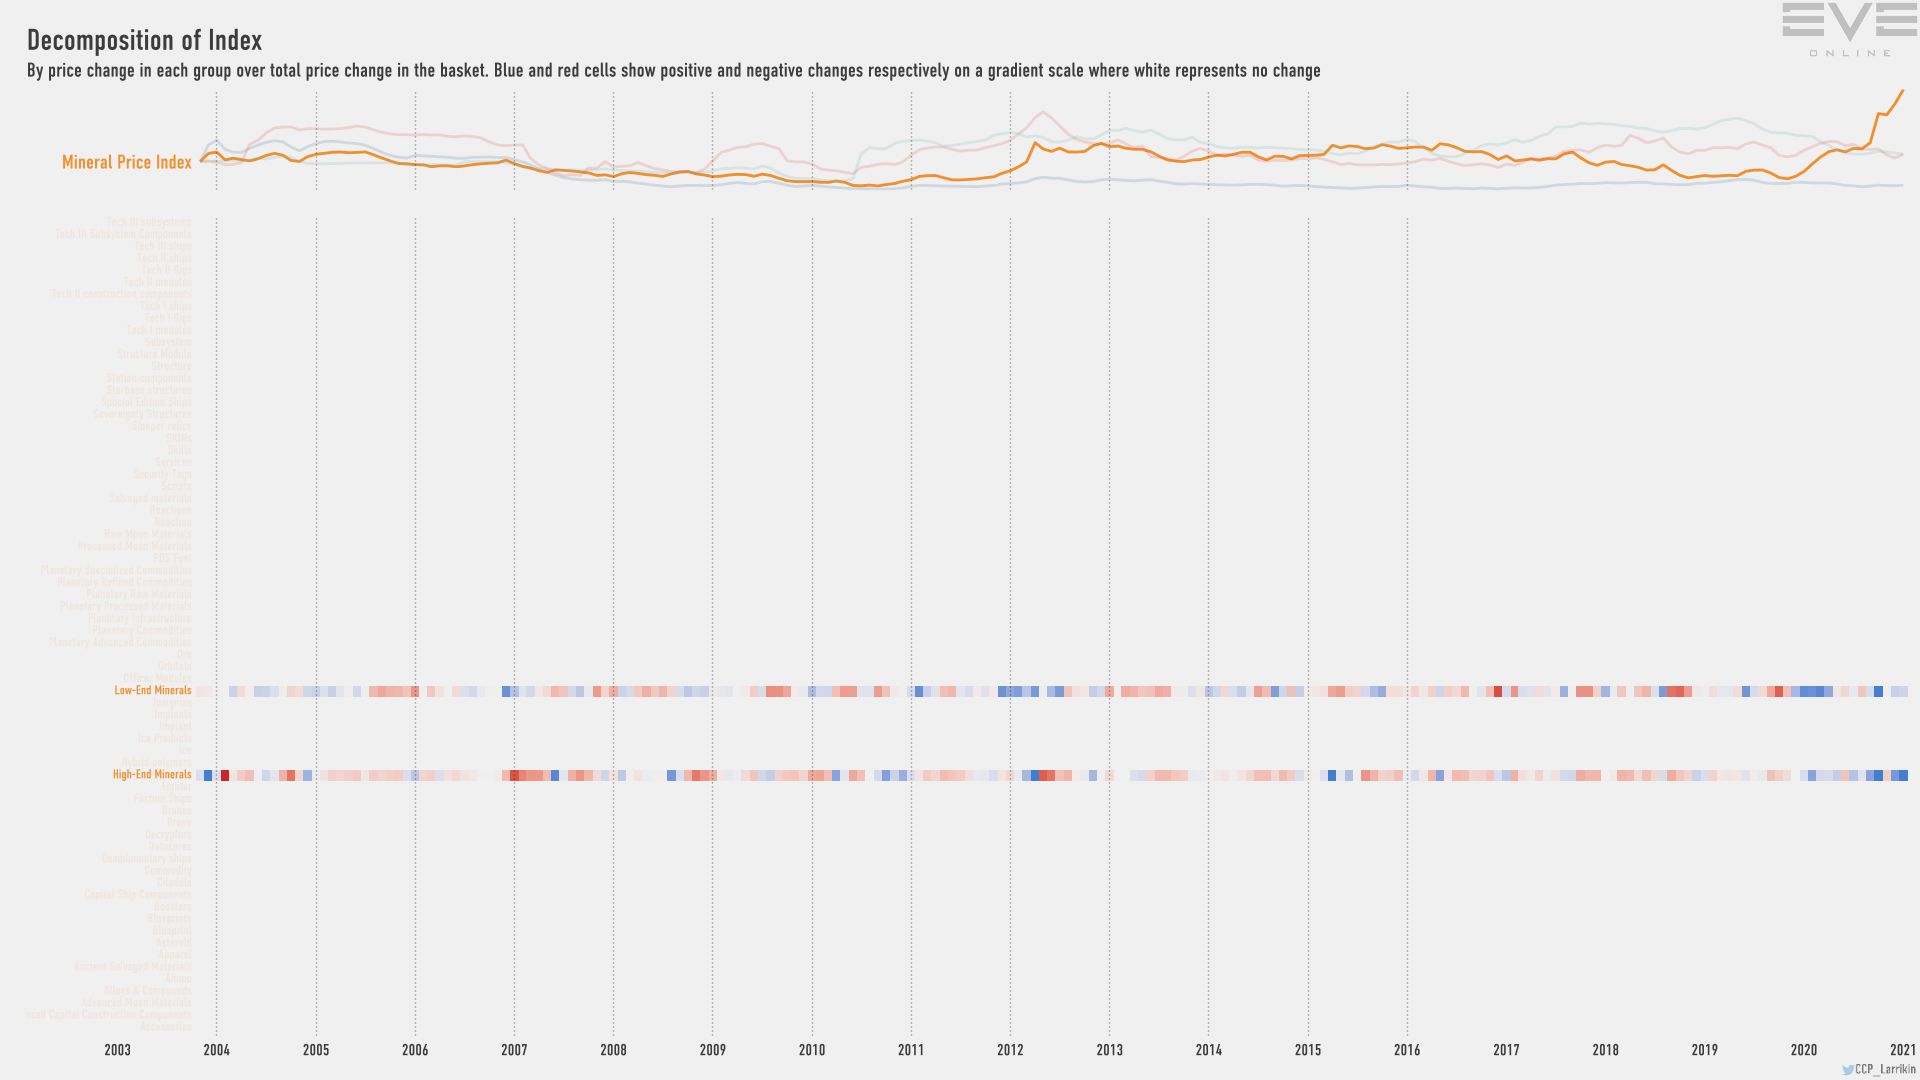 Jan2021 Index Decomp Mineral Price Index